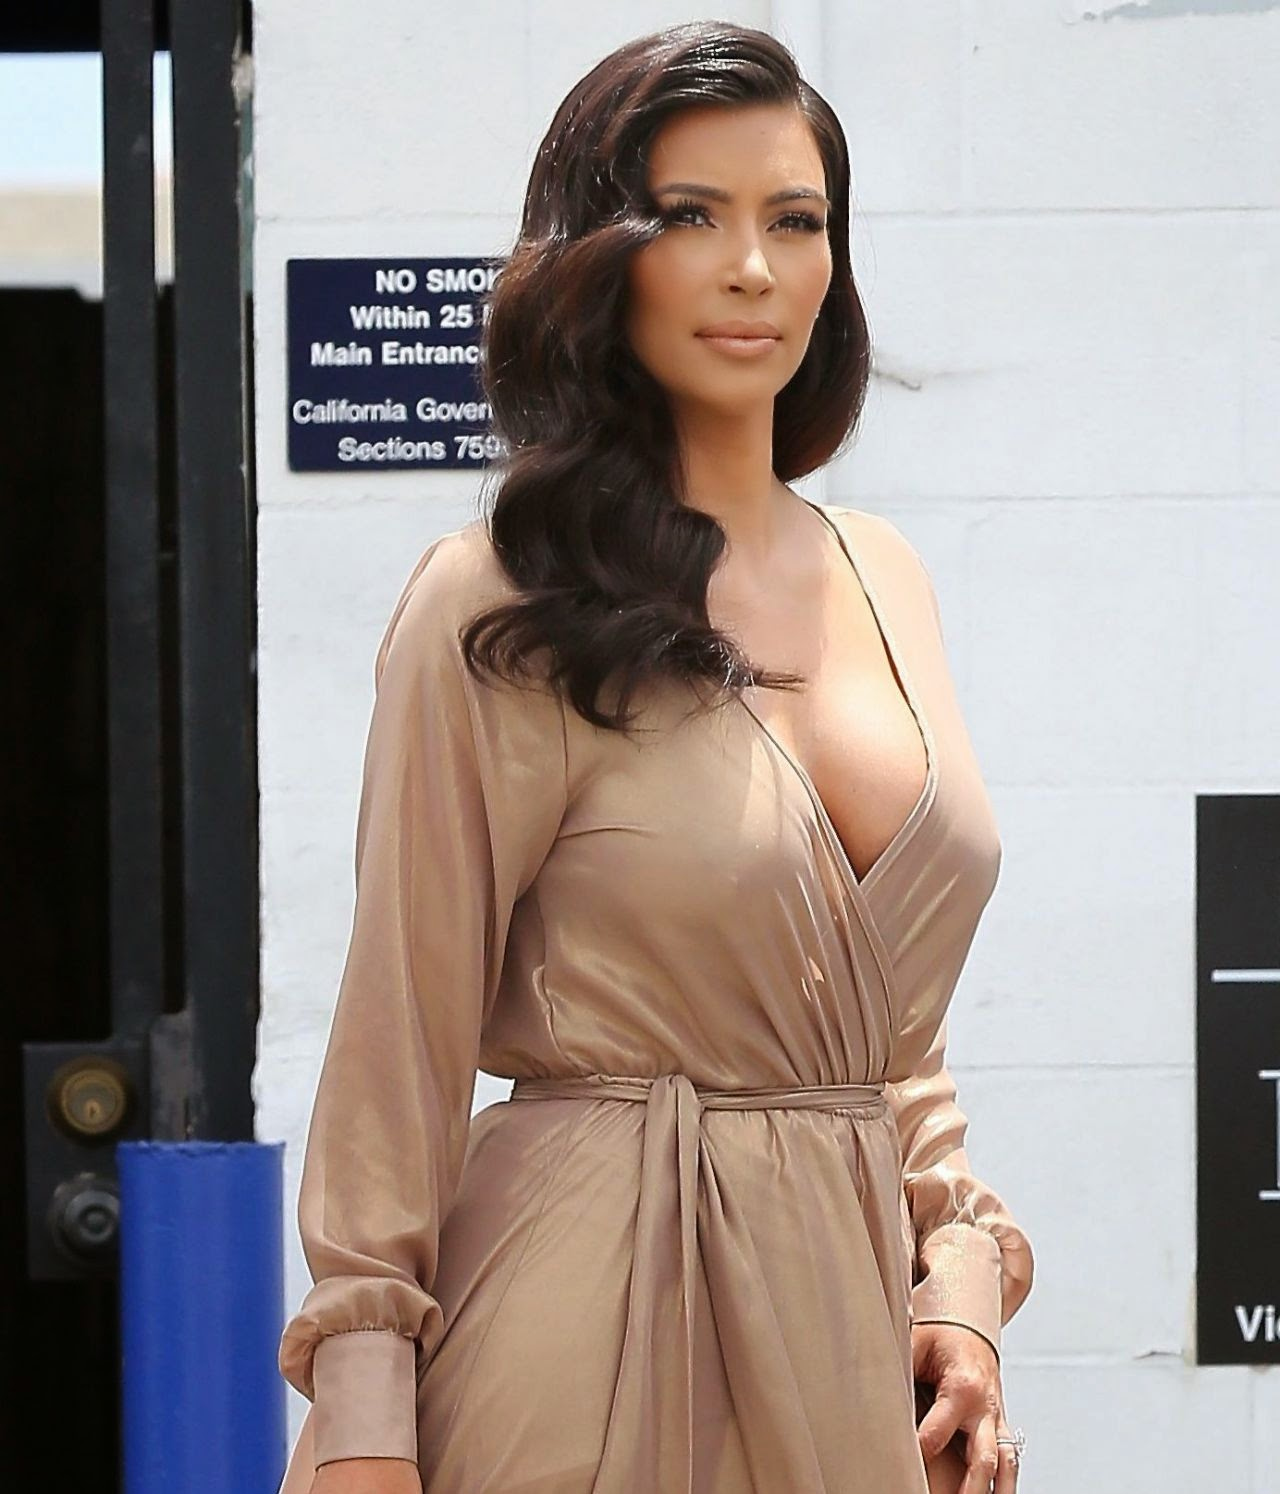 Kim Kardashian Deep Big Cleavage HQ Photos August 2014